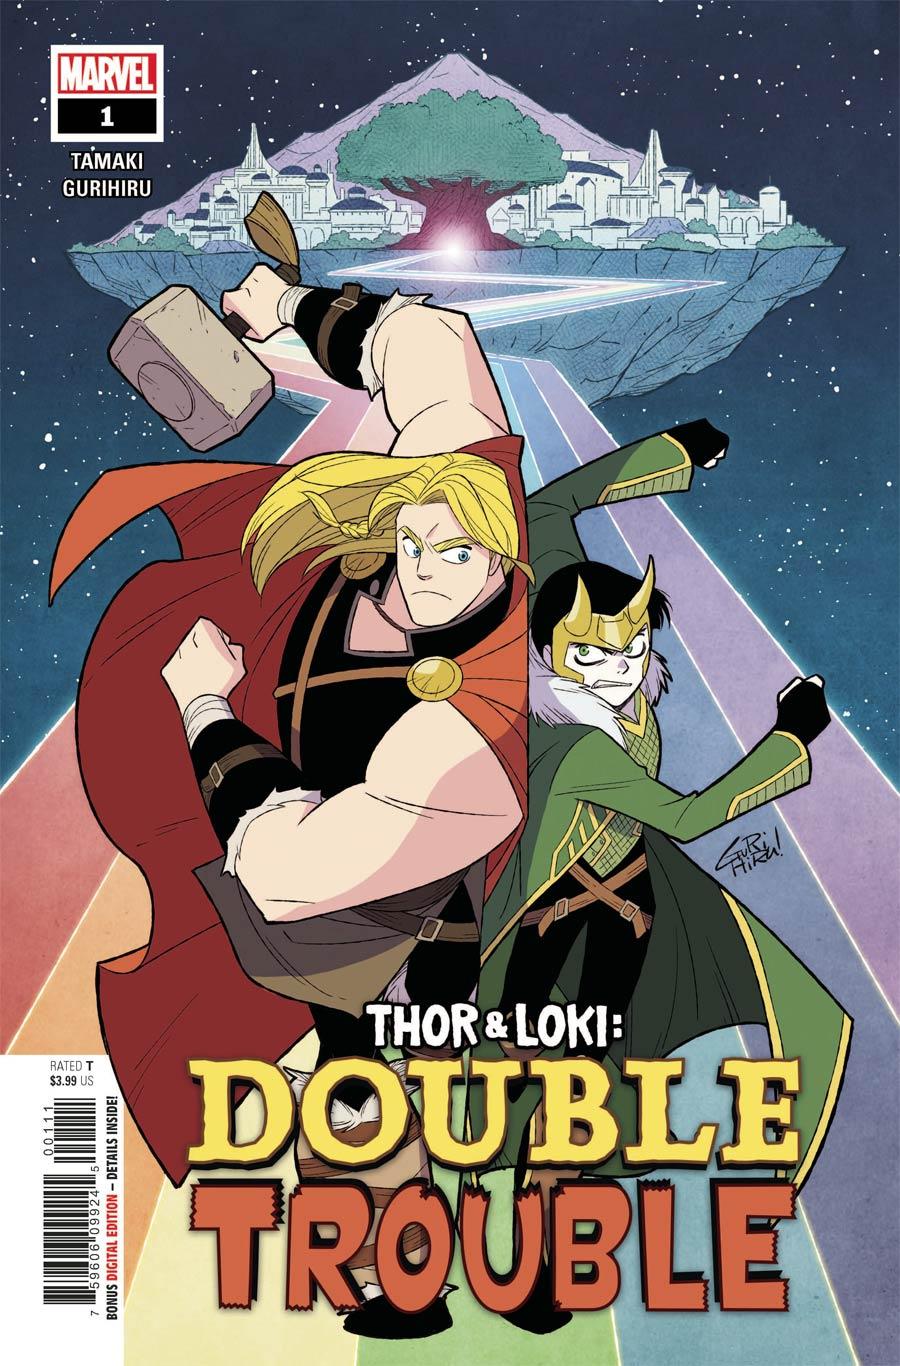 Thor & Loki Double Trouble #1 Cover A Regular Gurihiru Cover